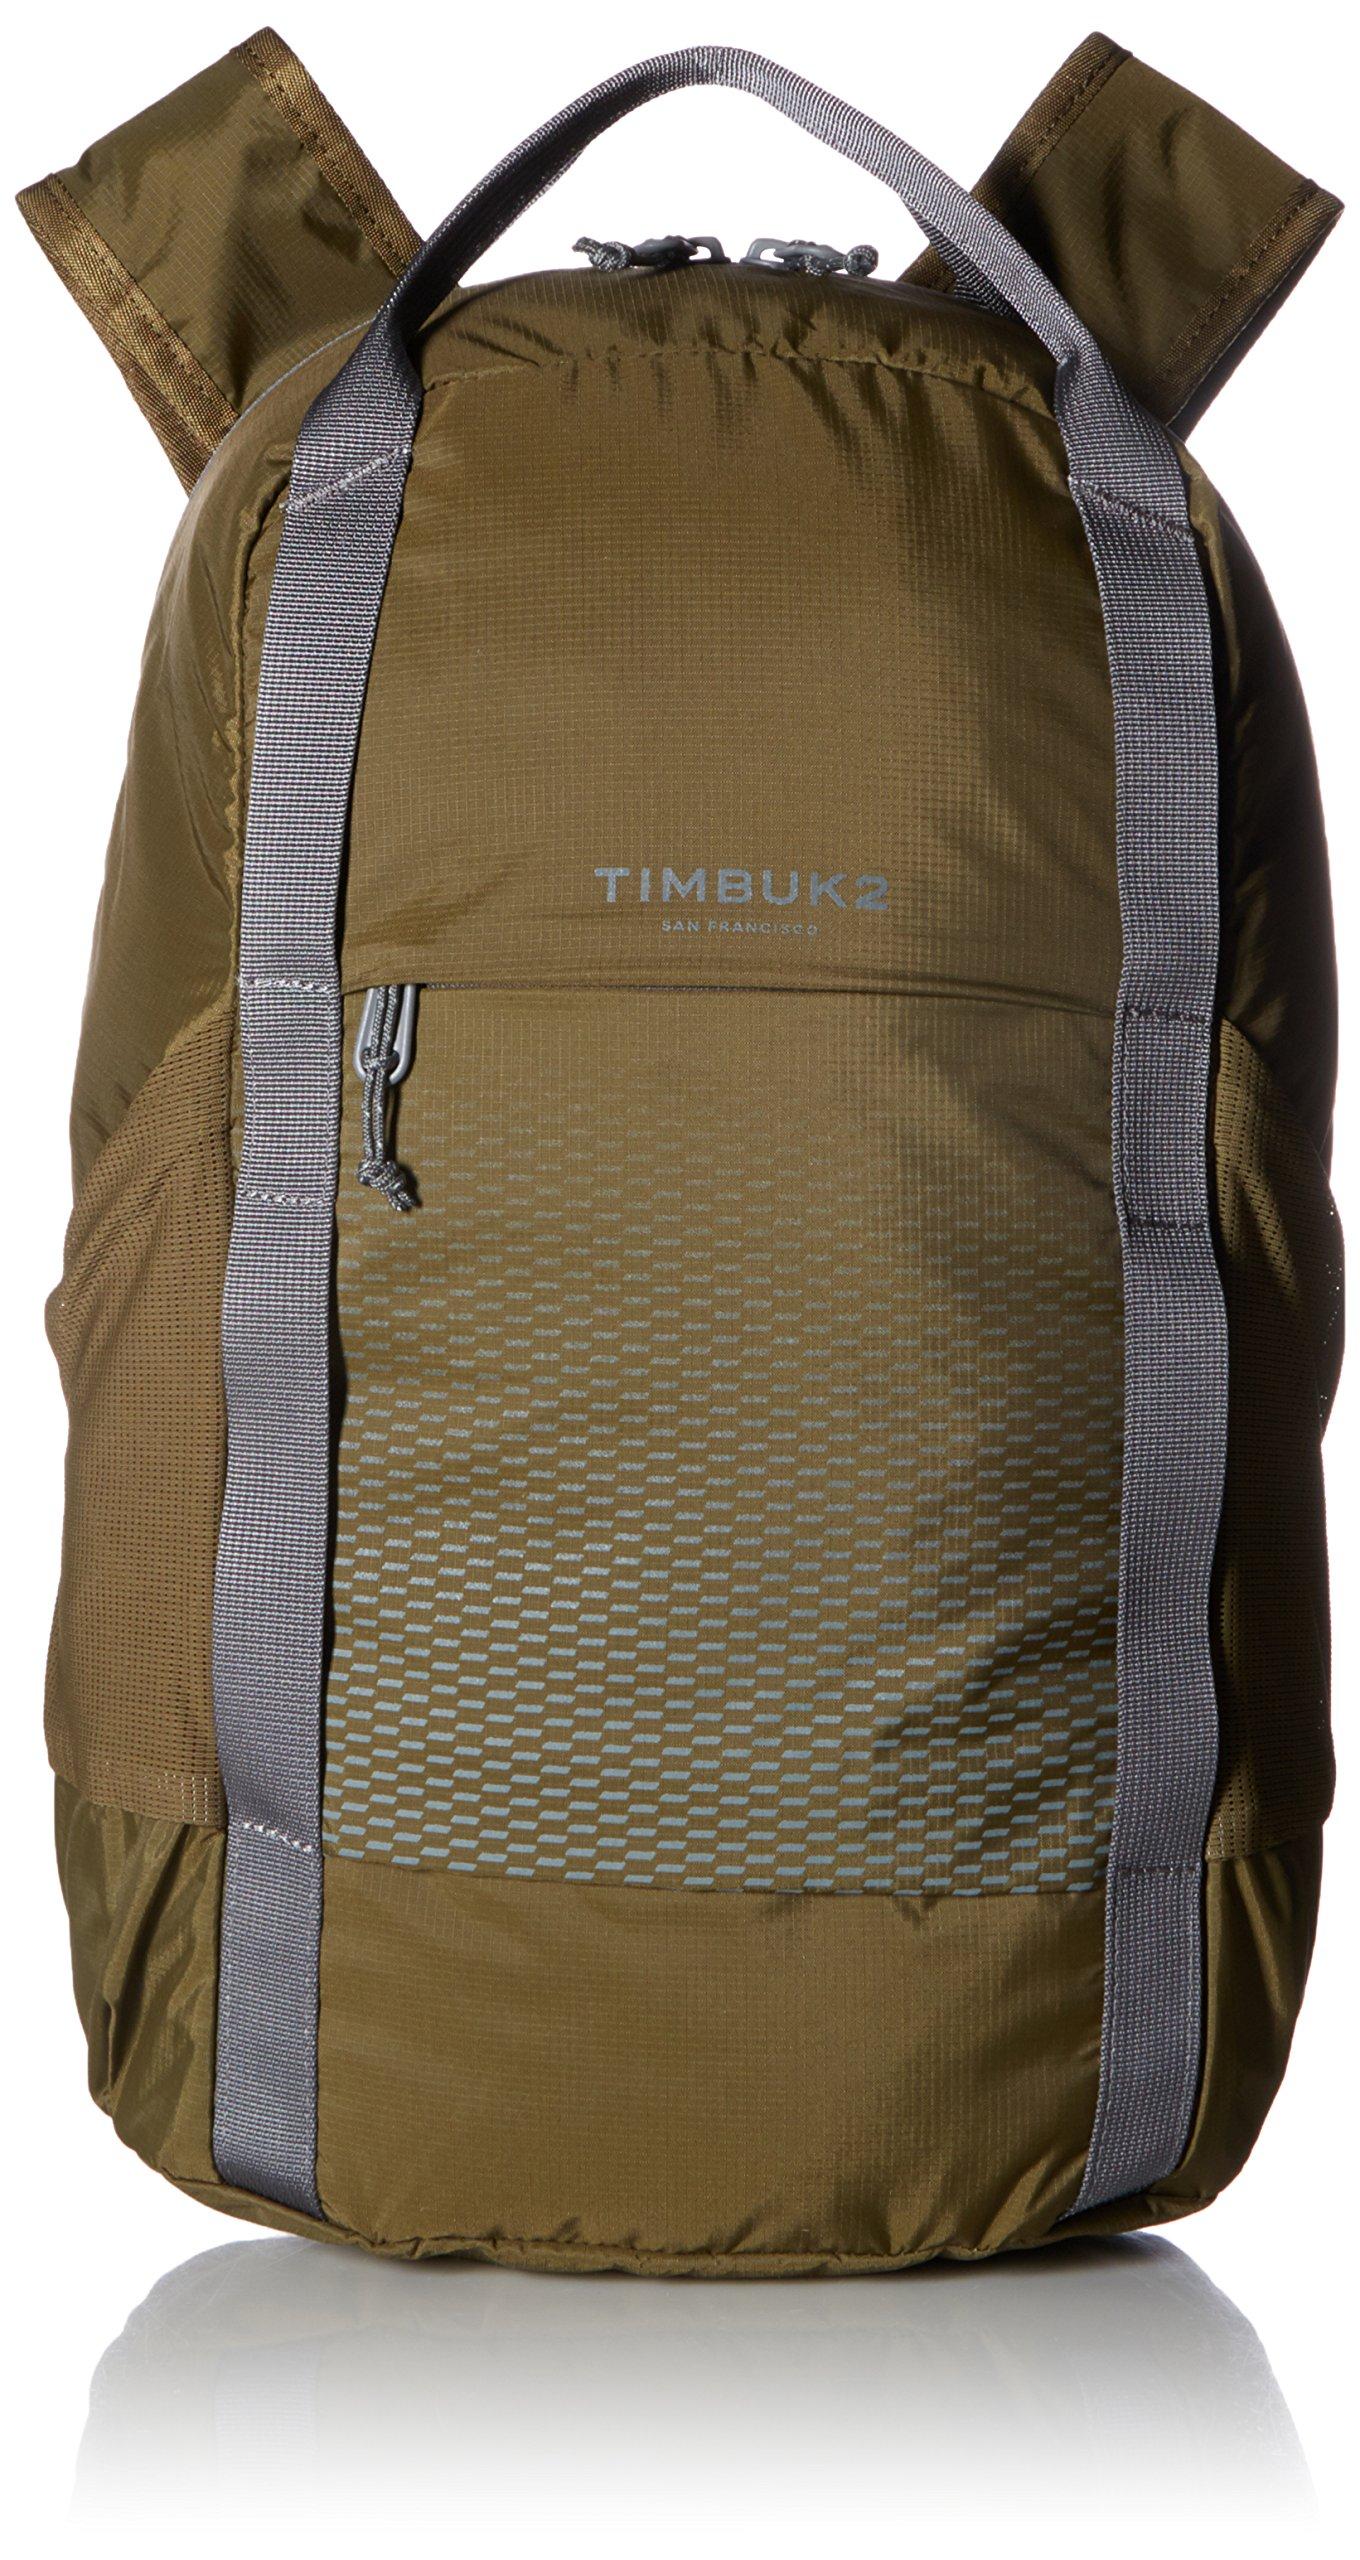 Timbuk2 Rift Tote Pack, Olivine, One Size by Timbuk2